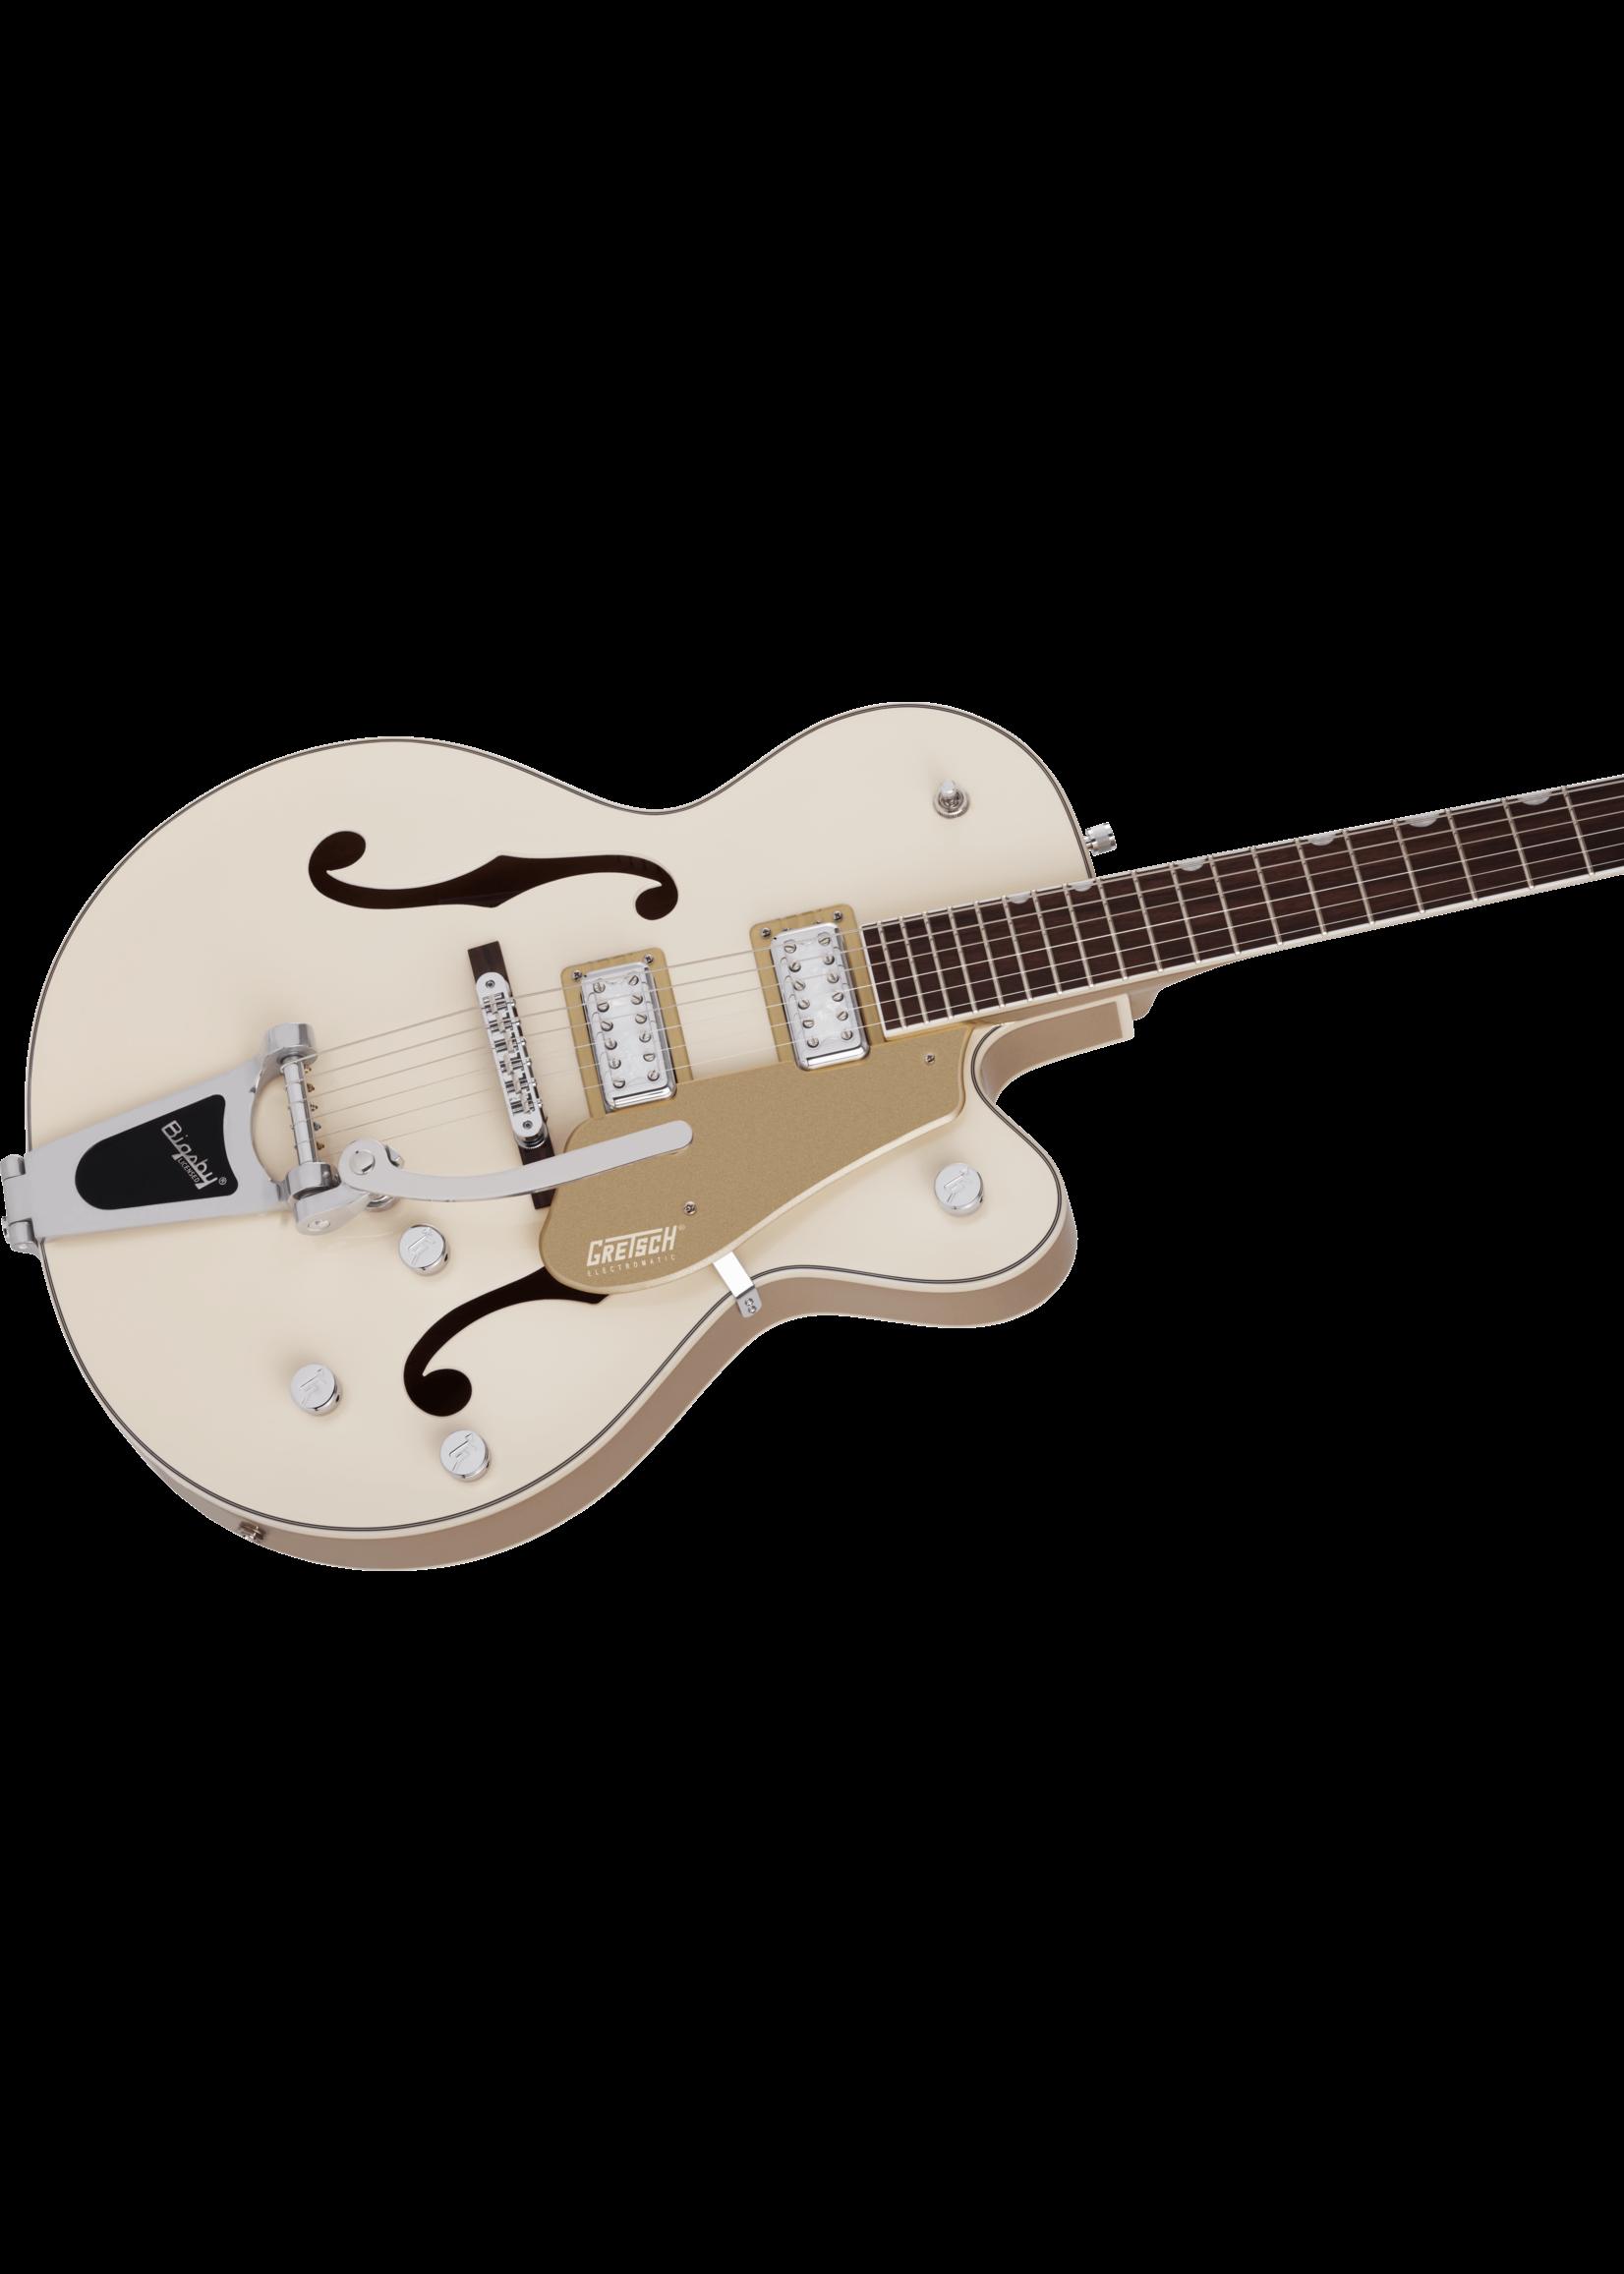 Gretsch Gretsch G5410T Electromatic Tri-Five Two Tone Vintage White/Casino Gold